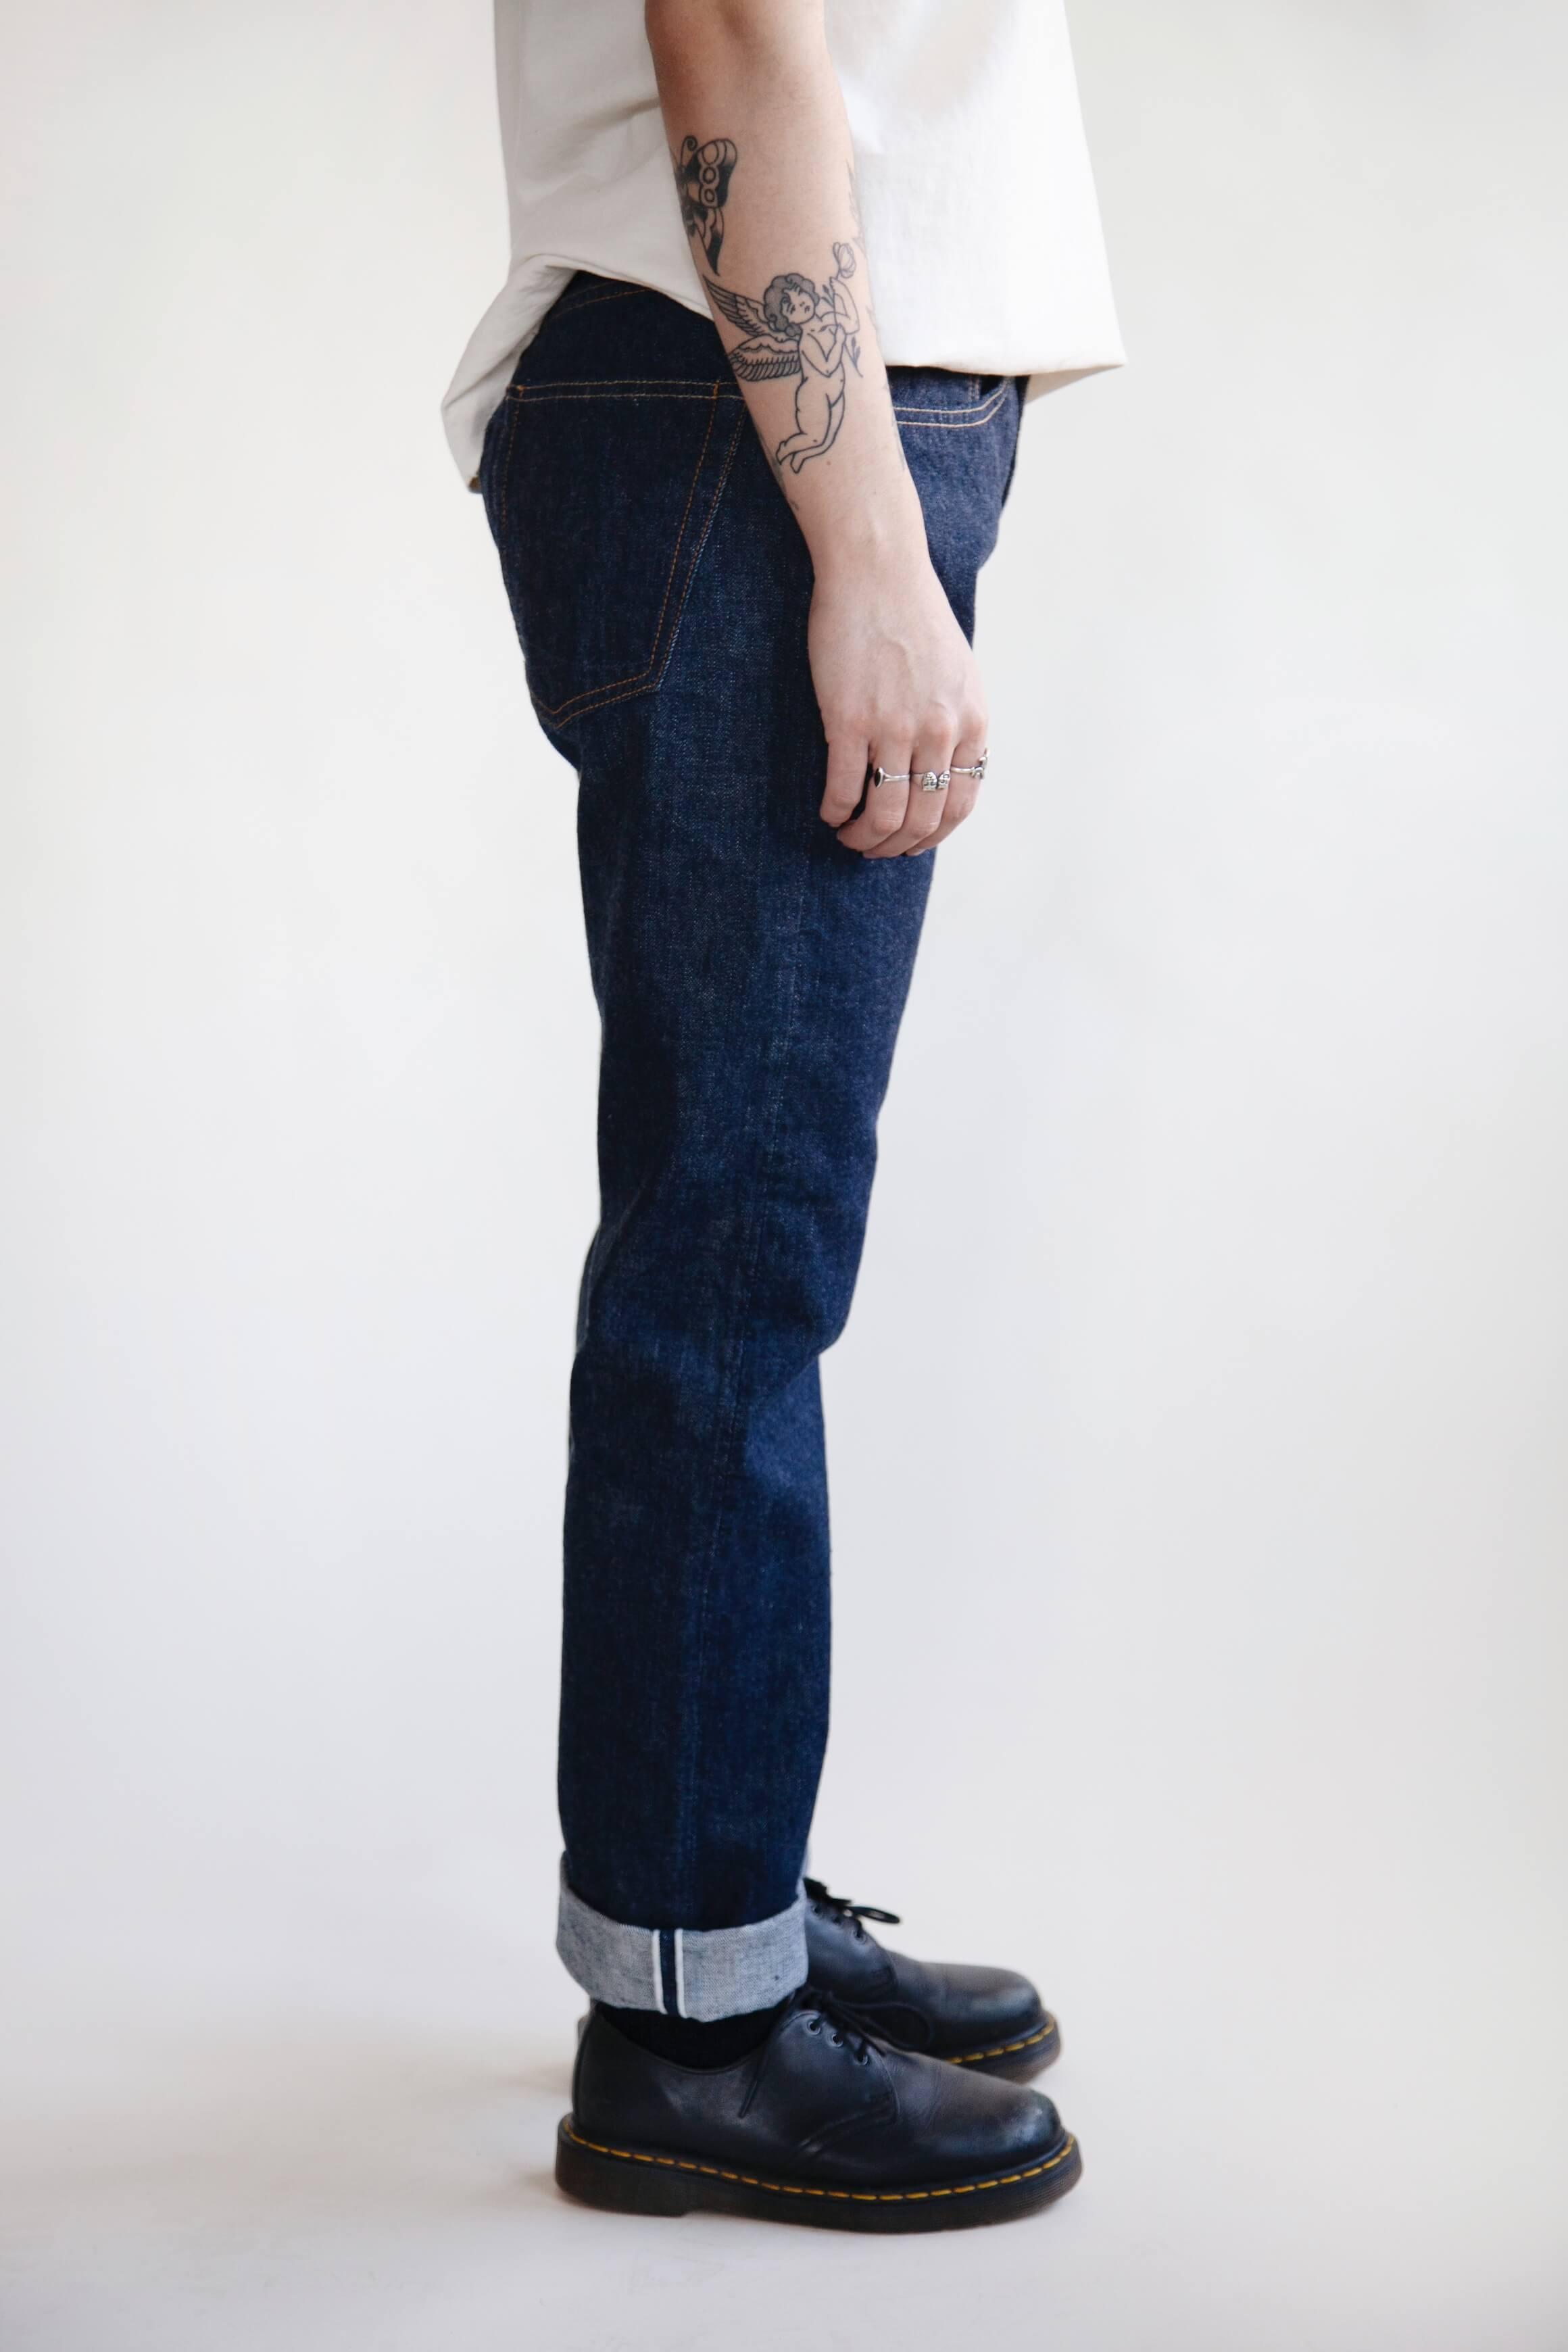 orslow 107 Ivy Denim - one wash on female model